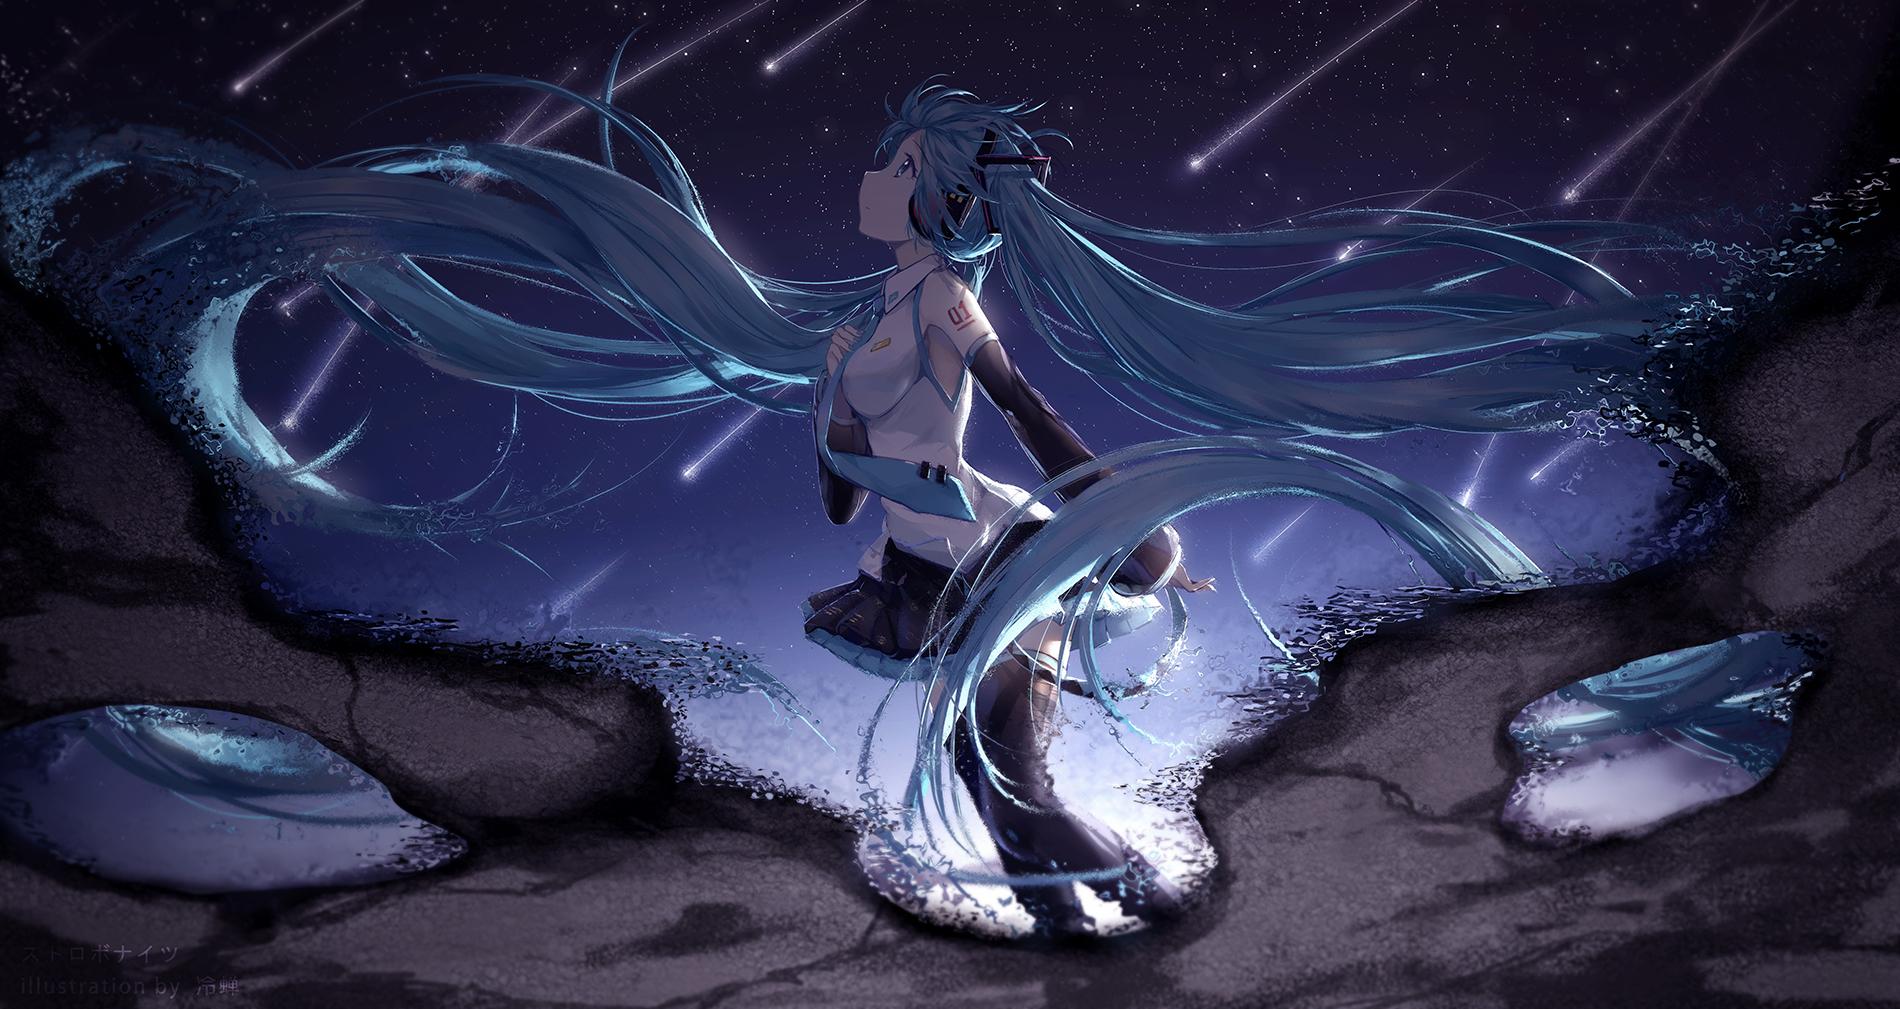 Night Sky of Stars